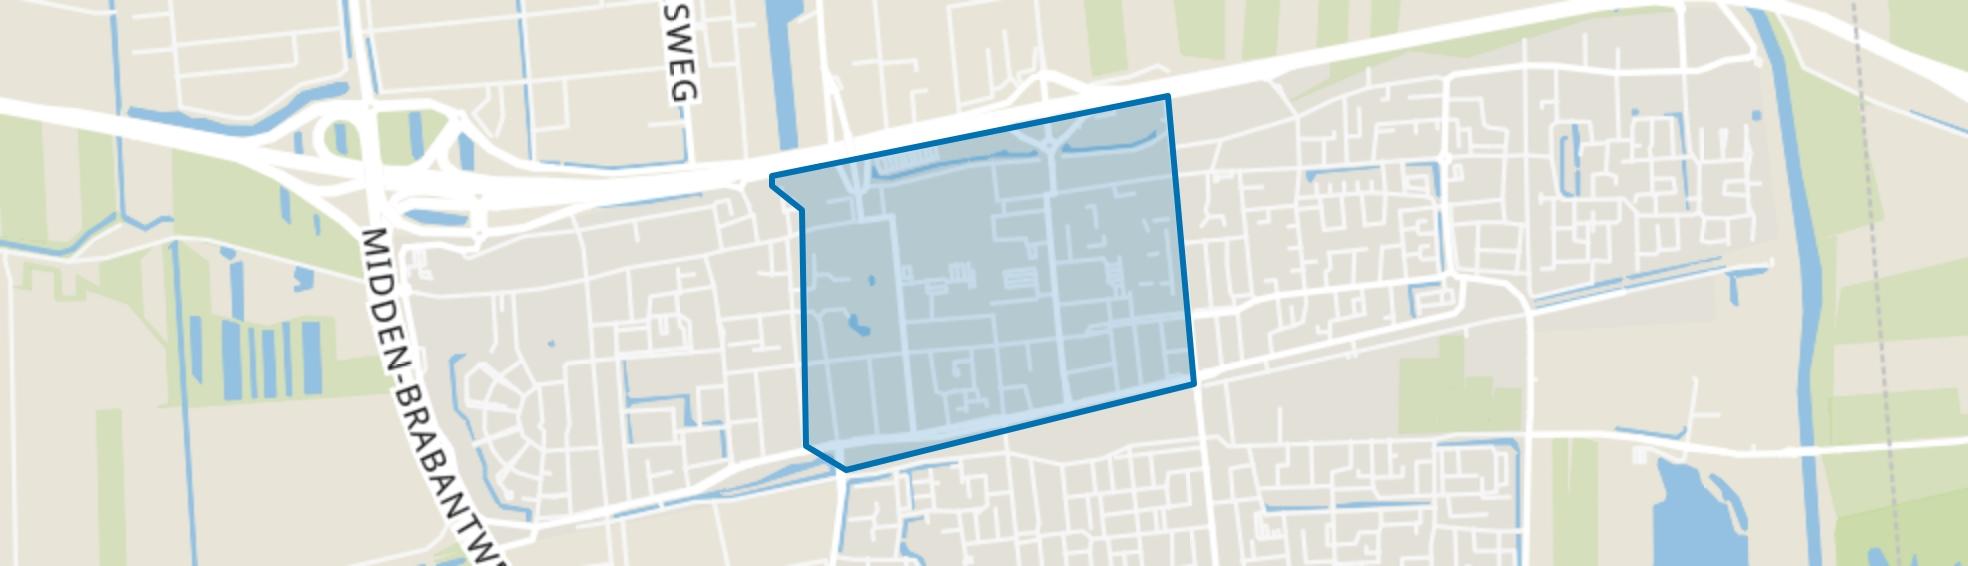 Centrum, Waalwijk map